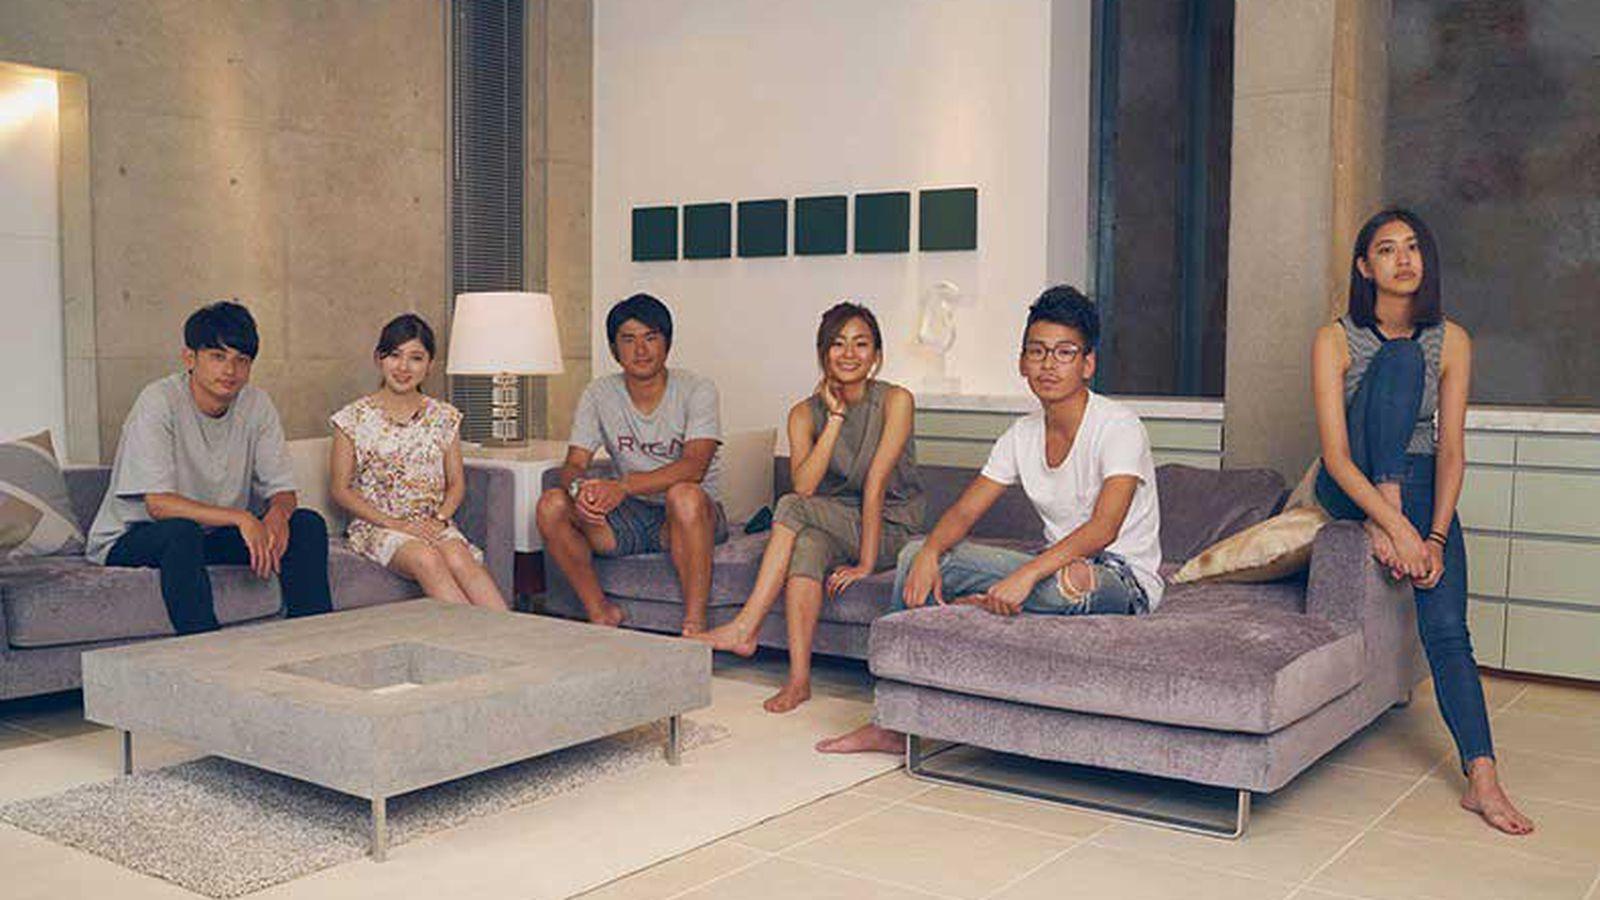 Modern Pin Up Girls Wallpaper Netflix S Terrace House Finds Meaning In Mundane Human